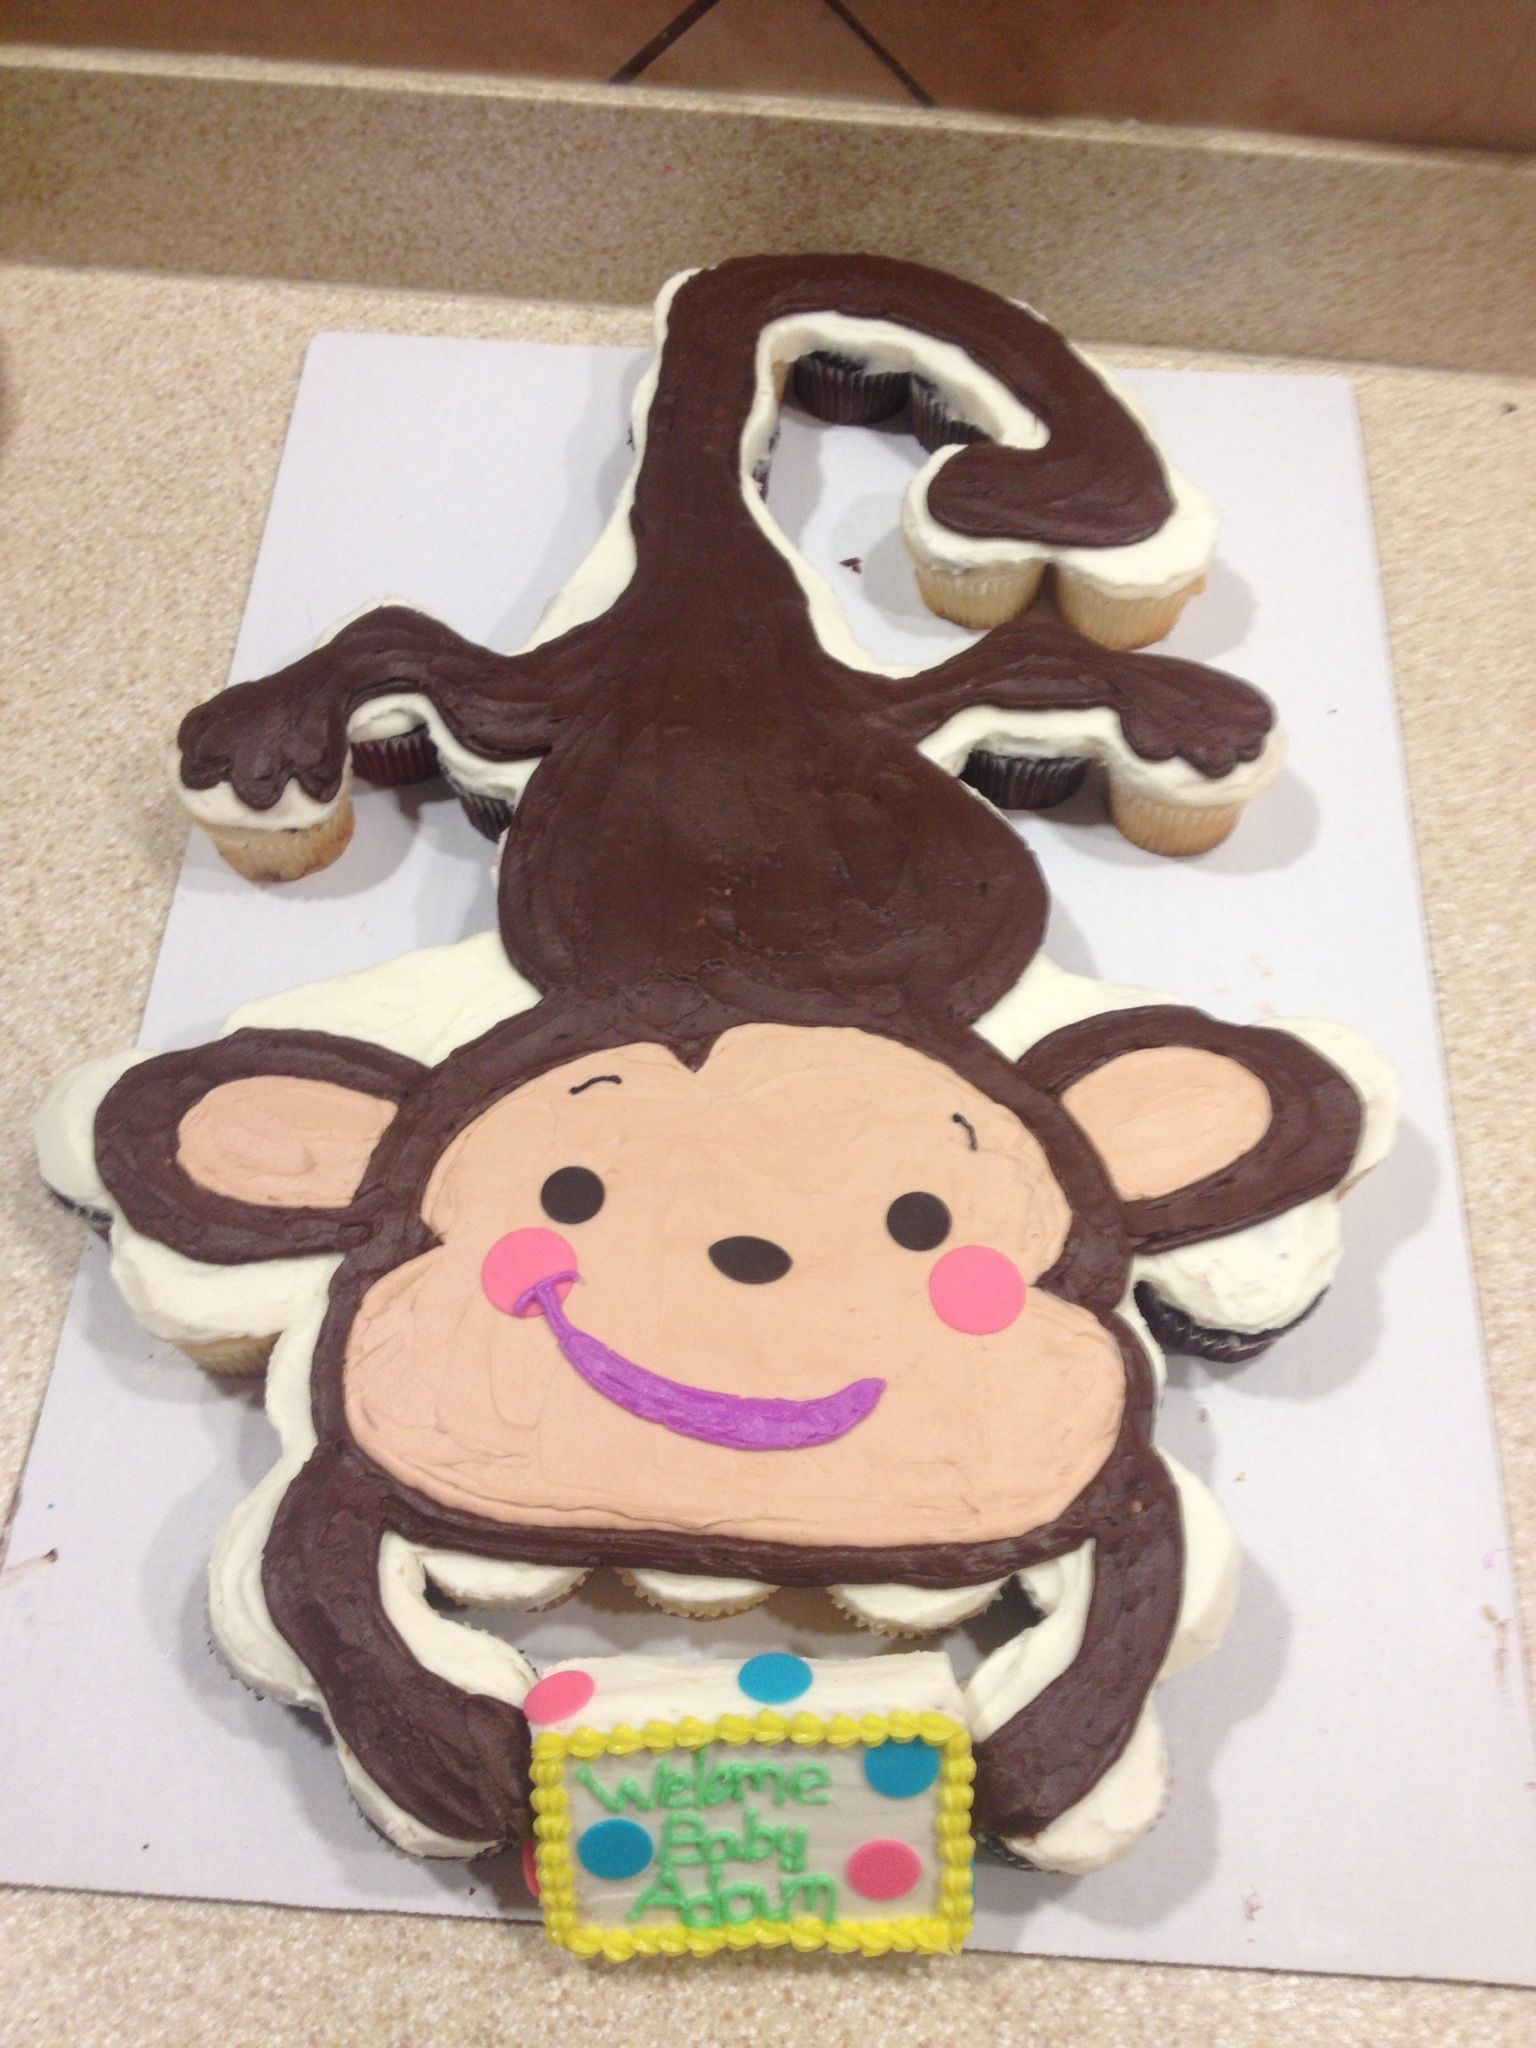 Desserts (Cupcakes)